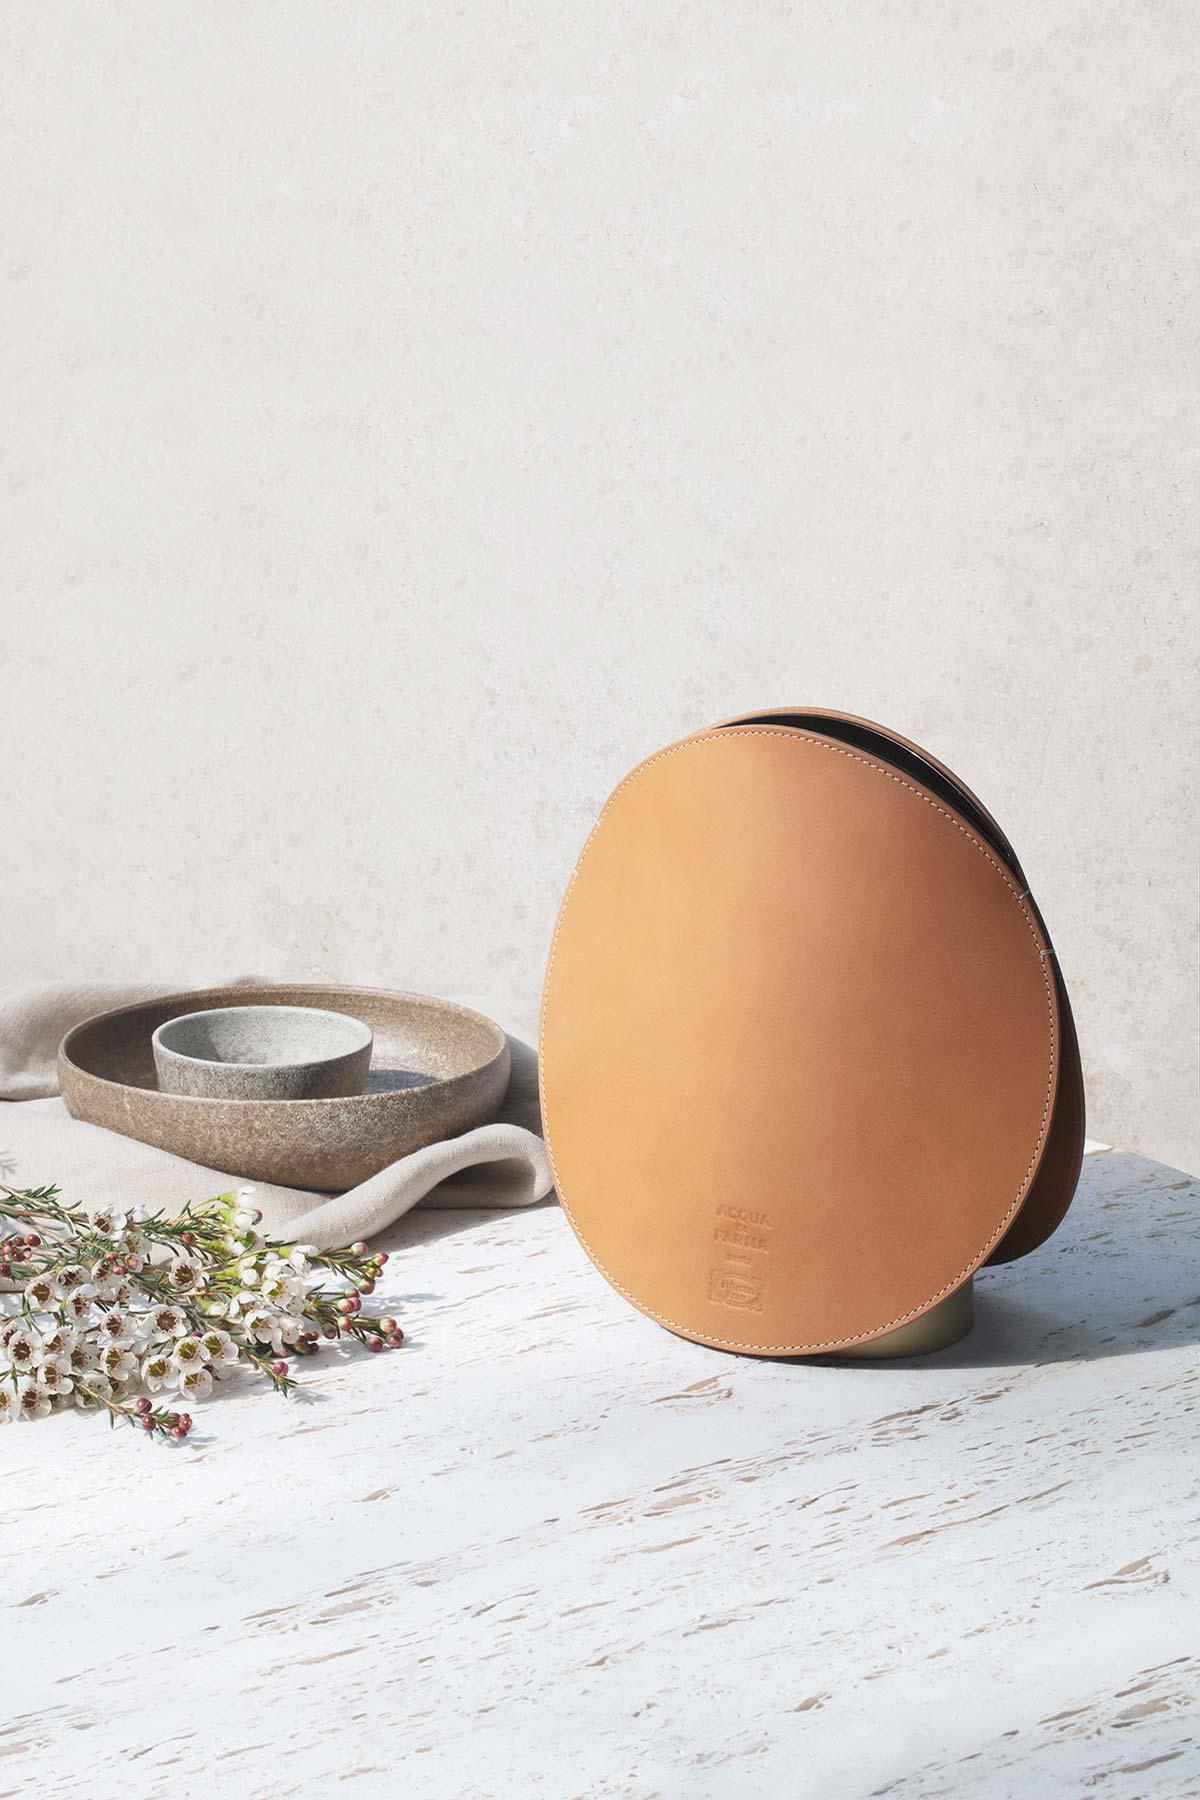 Smart Home Diffuser by Acqua di Parma & Poltrona Frau, Design GamFratesi - Photo © Irina Boersma